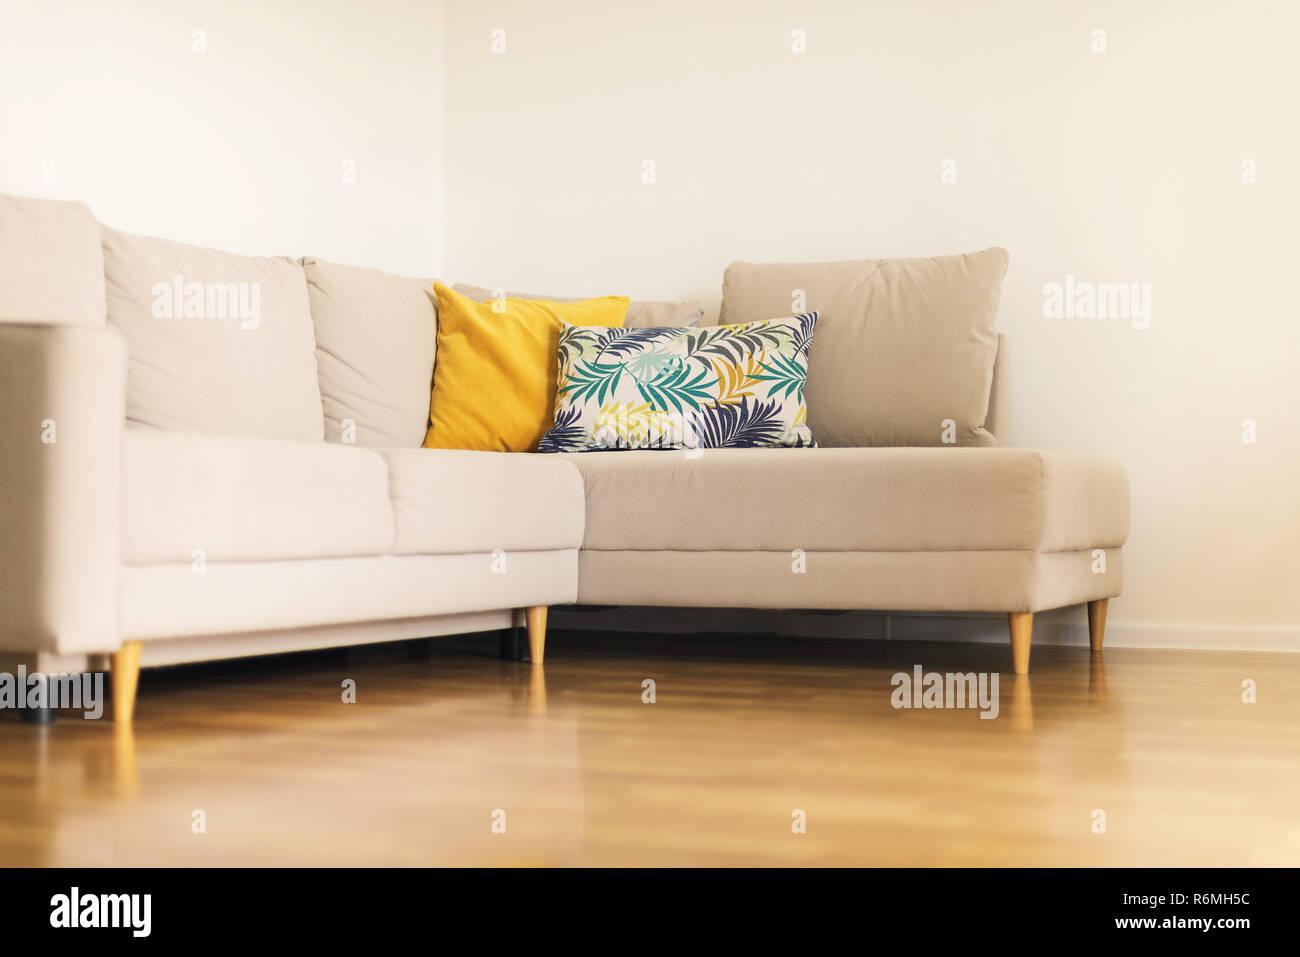 Pareti Bianche E Beige : Beige walls immagini beige walls fotos stock alamy